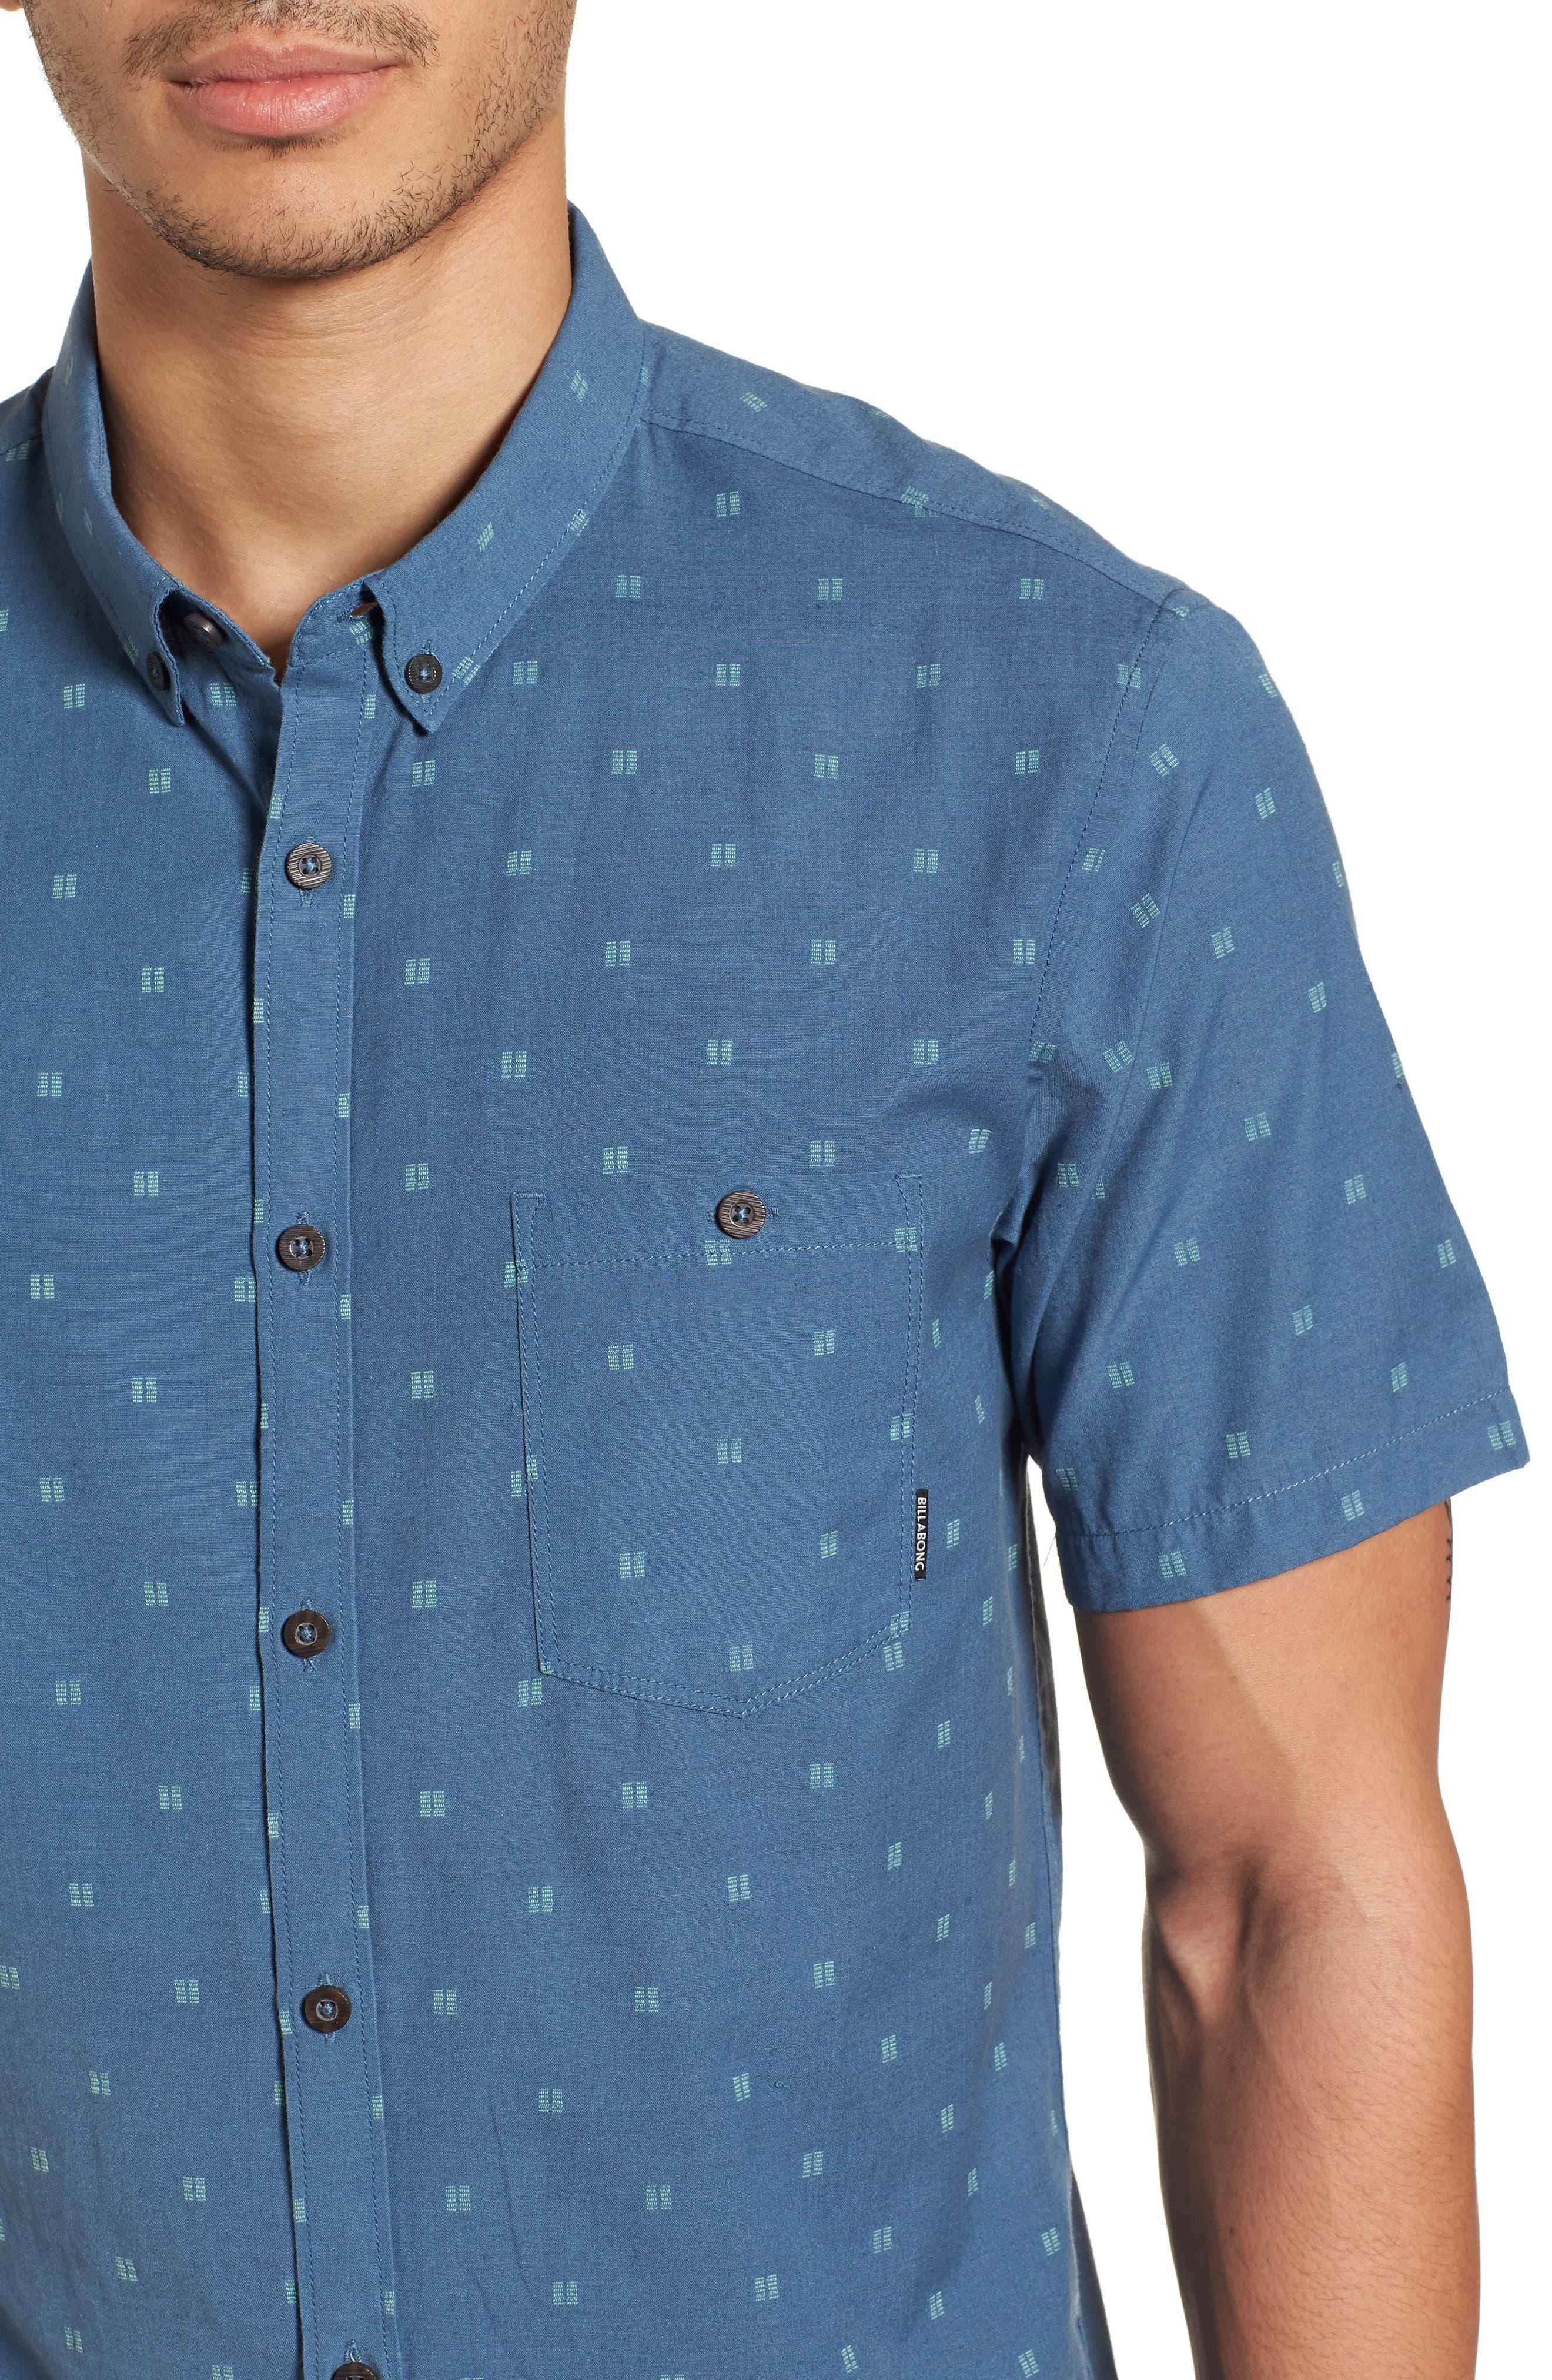 All Day Jacquard Shirt,                             Alternate thumbnail 2, color,                             Deep Blue